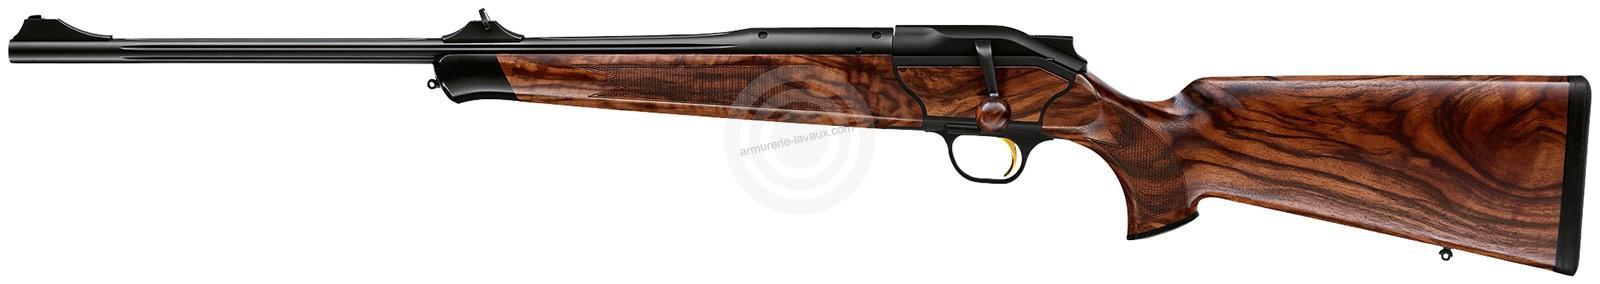 Carabine BLASER R8 DIPLOMATE Gaucher